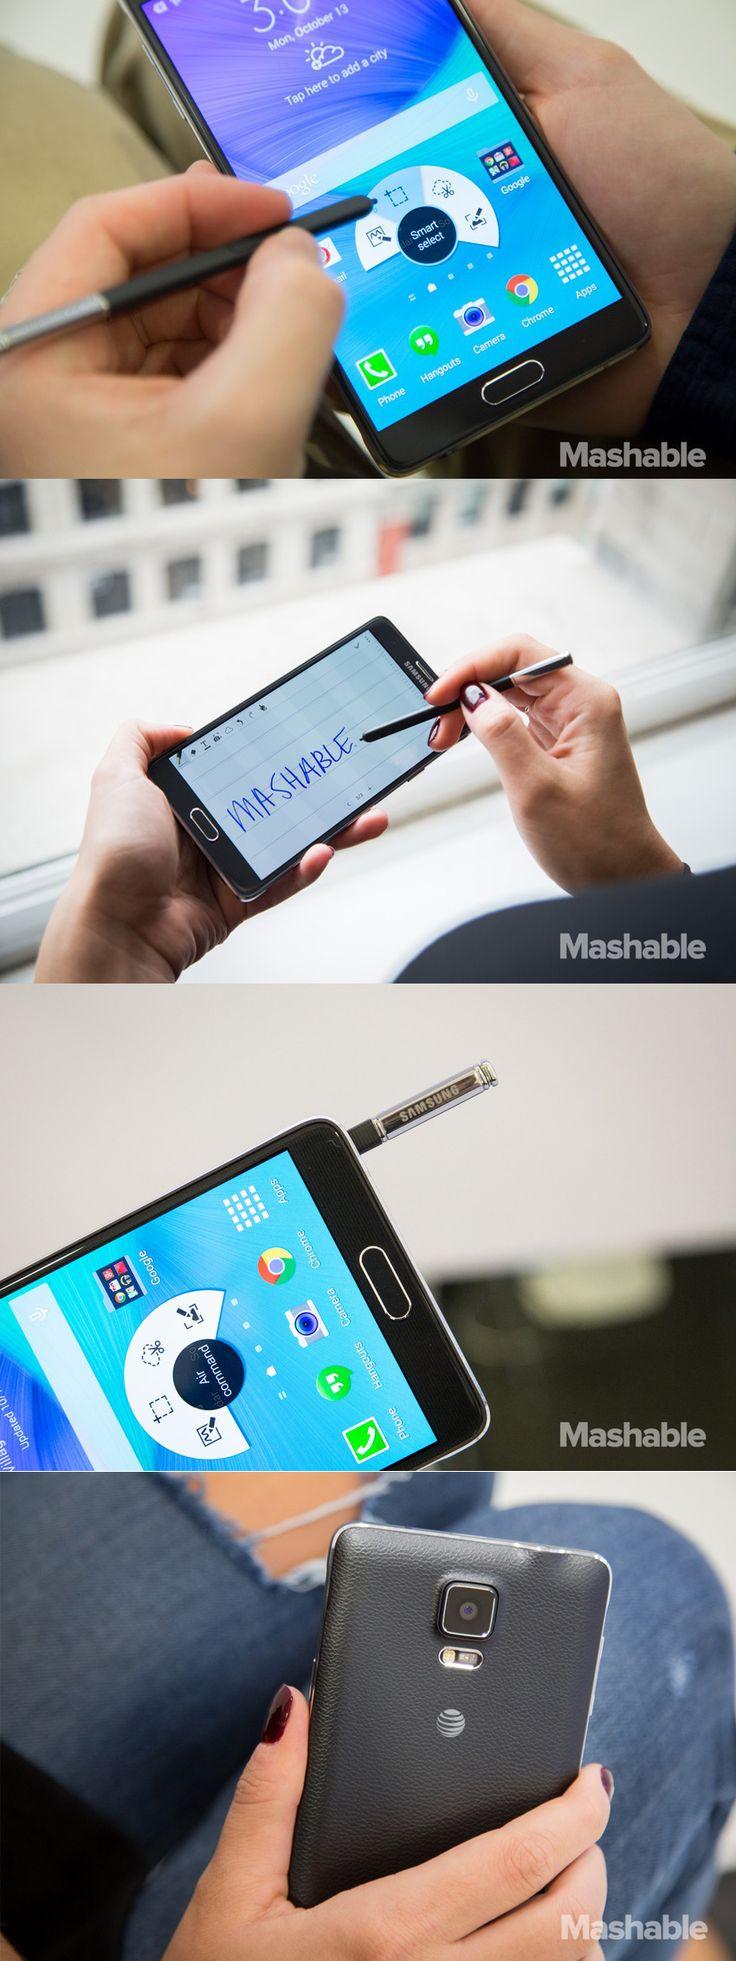 best cool gadgets images on pinterest good ideas tech gadgets